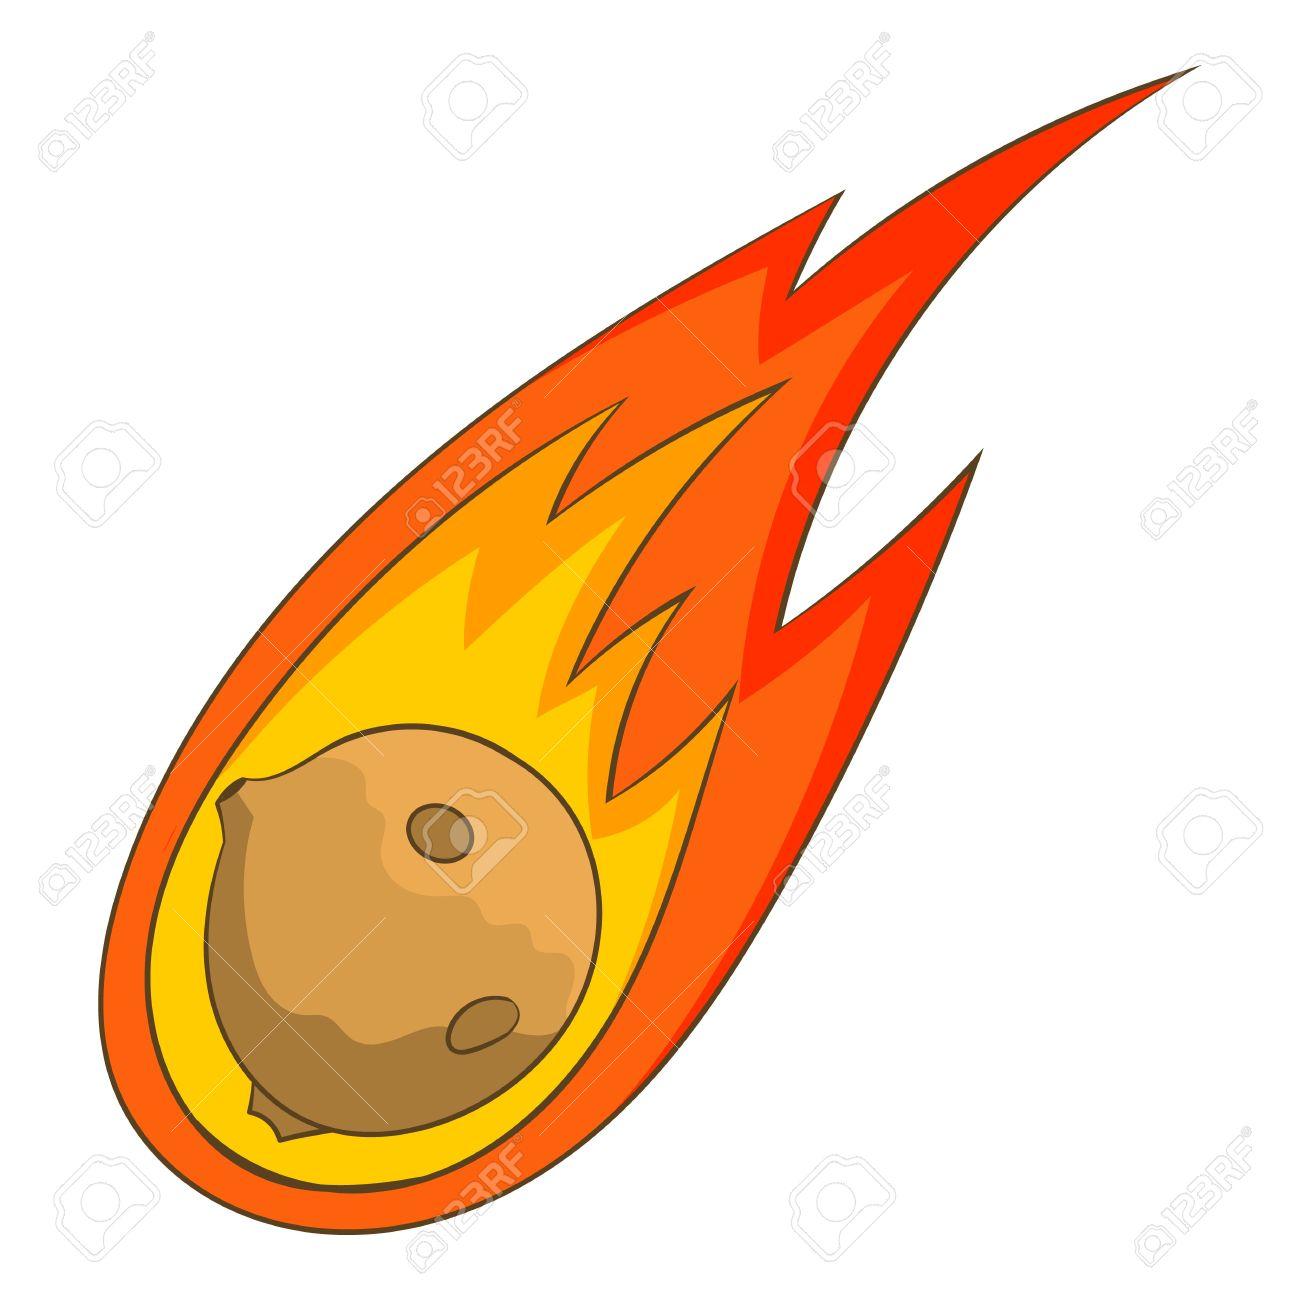 Icône De Météorite à La Flamme Illustration De Dessin Animé D Icône